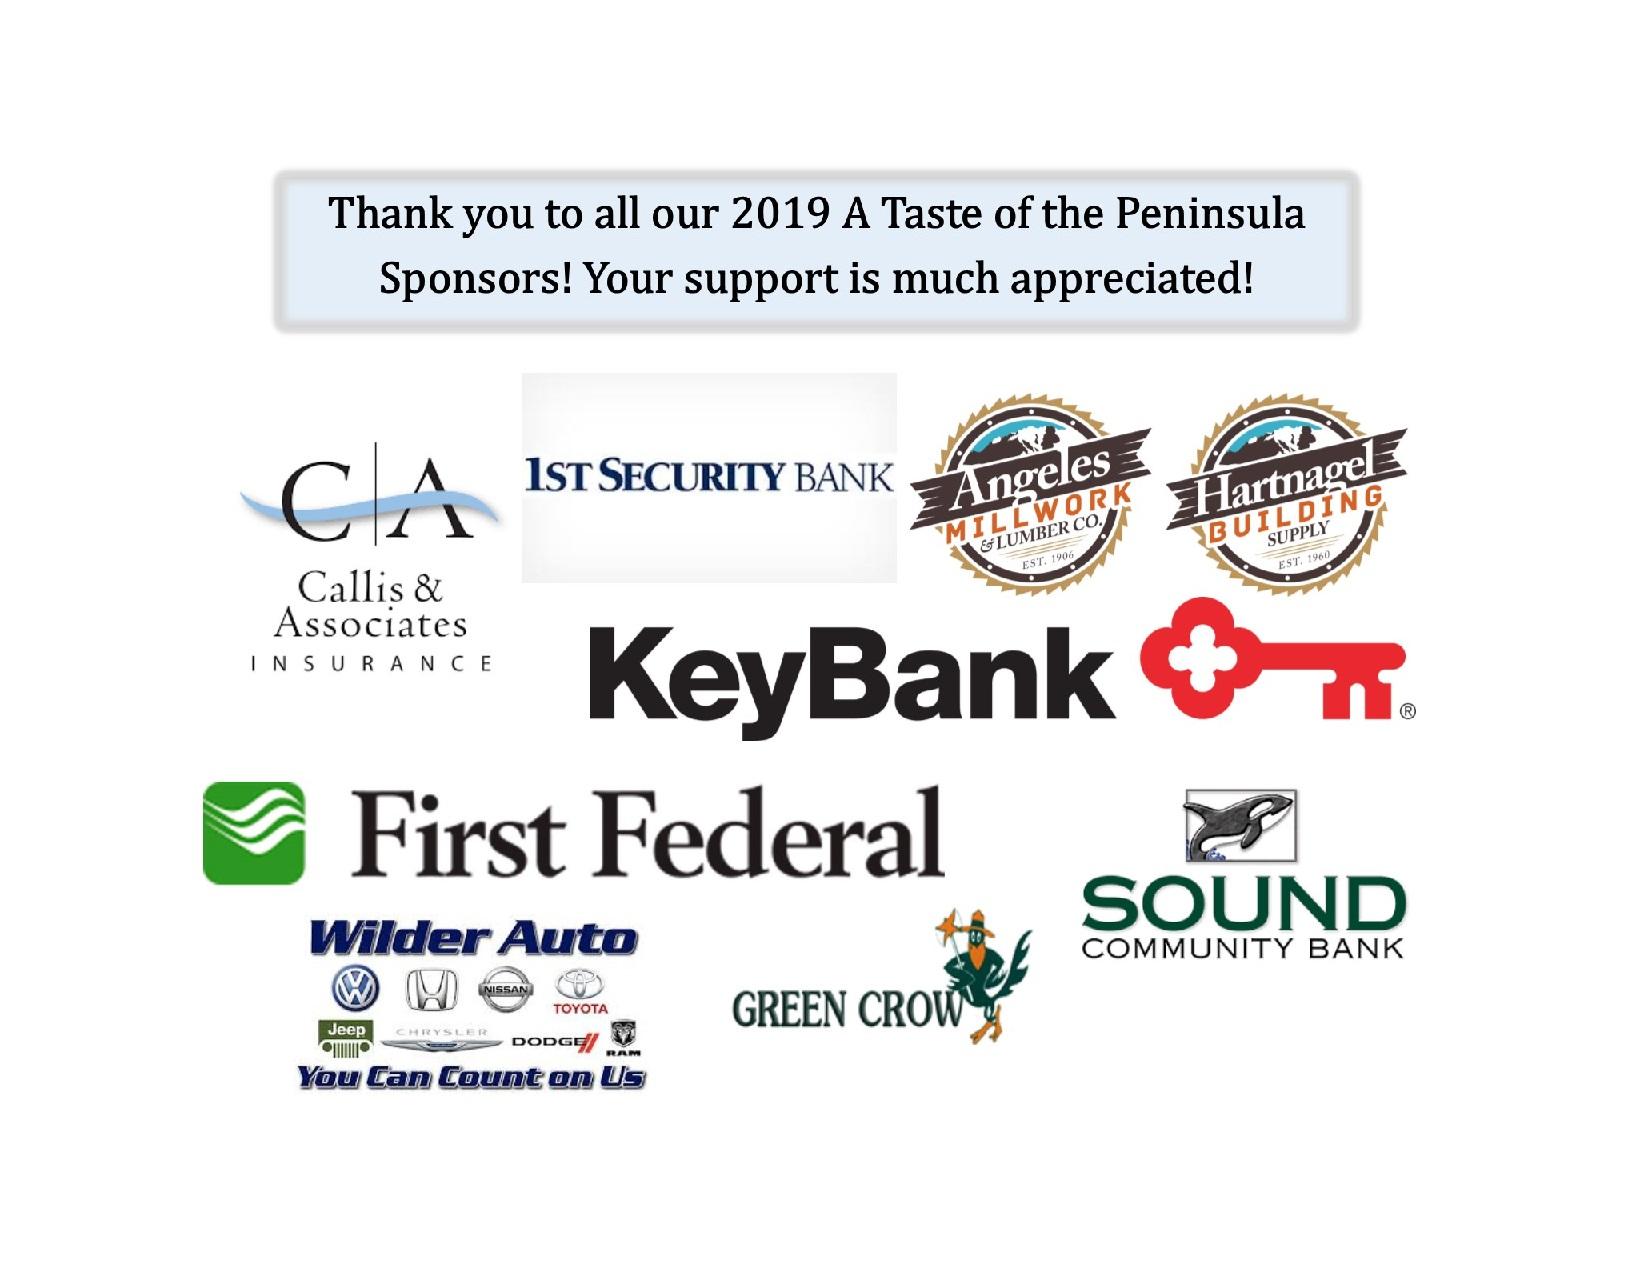 2019 A Taste of the Peninsula Sponsors